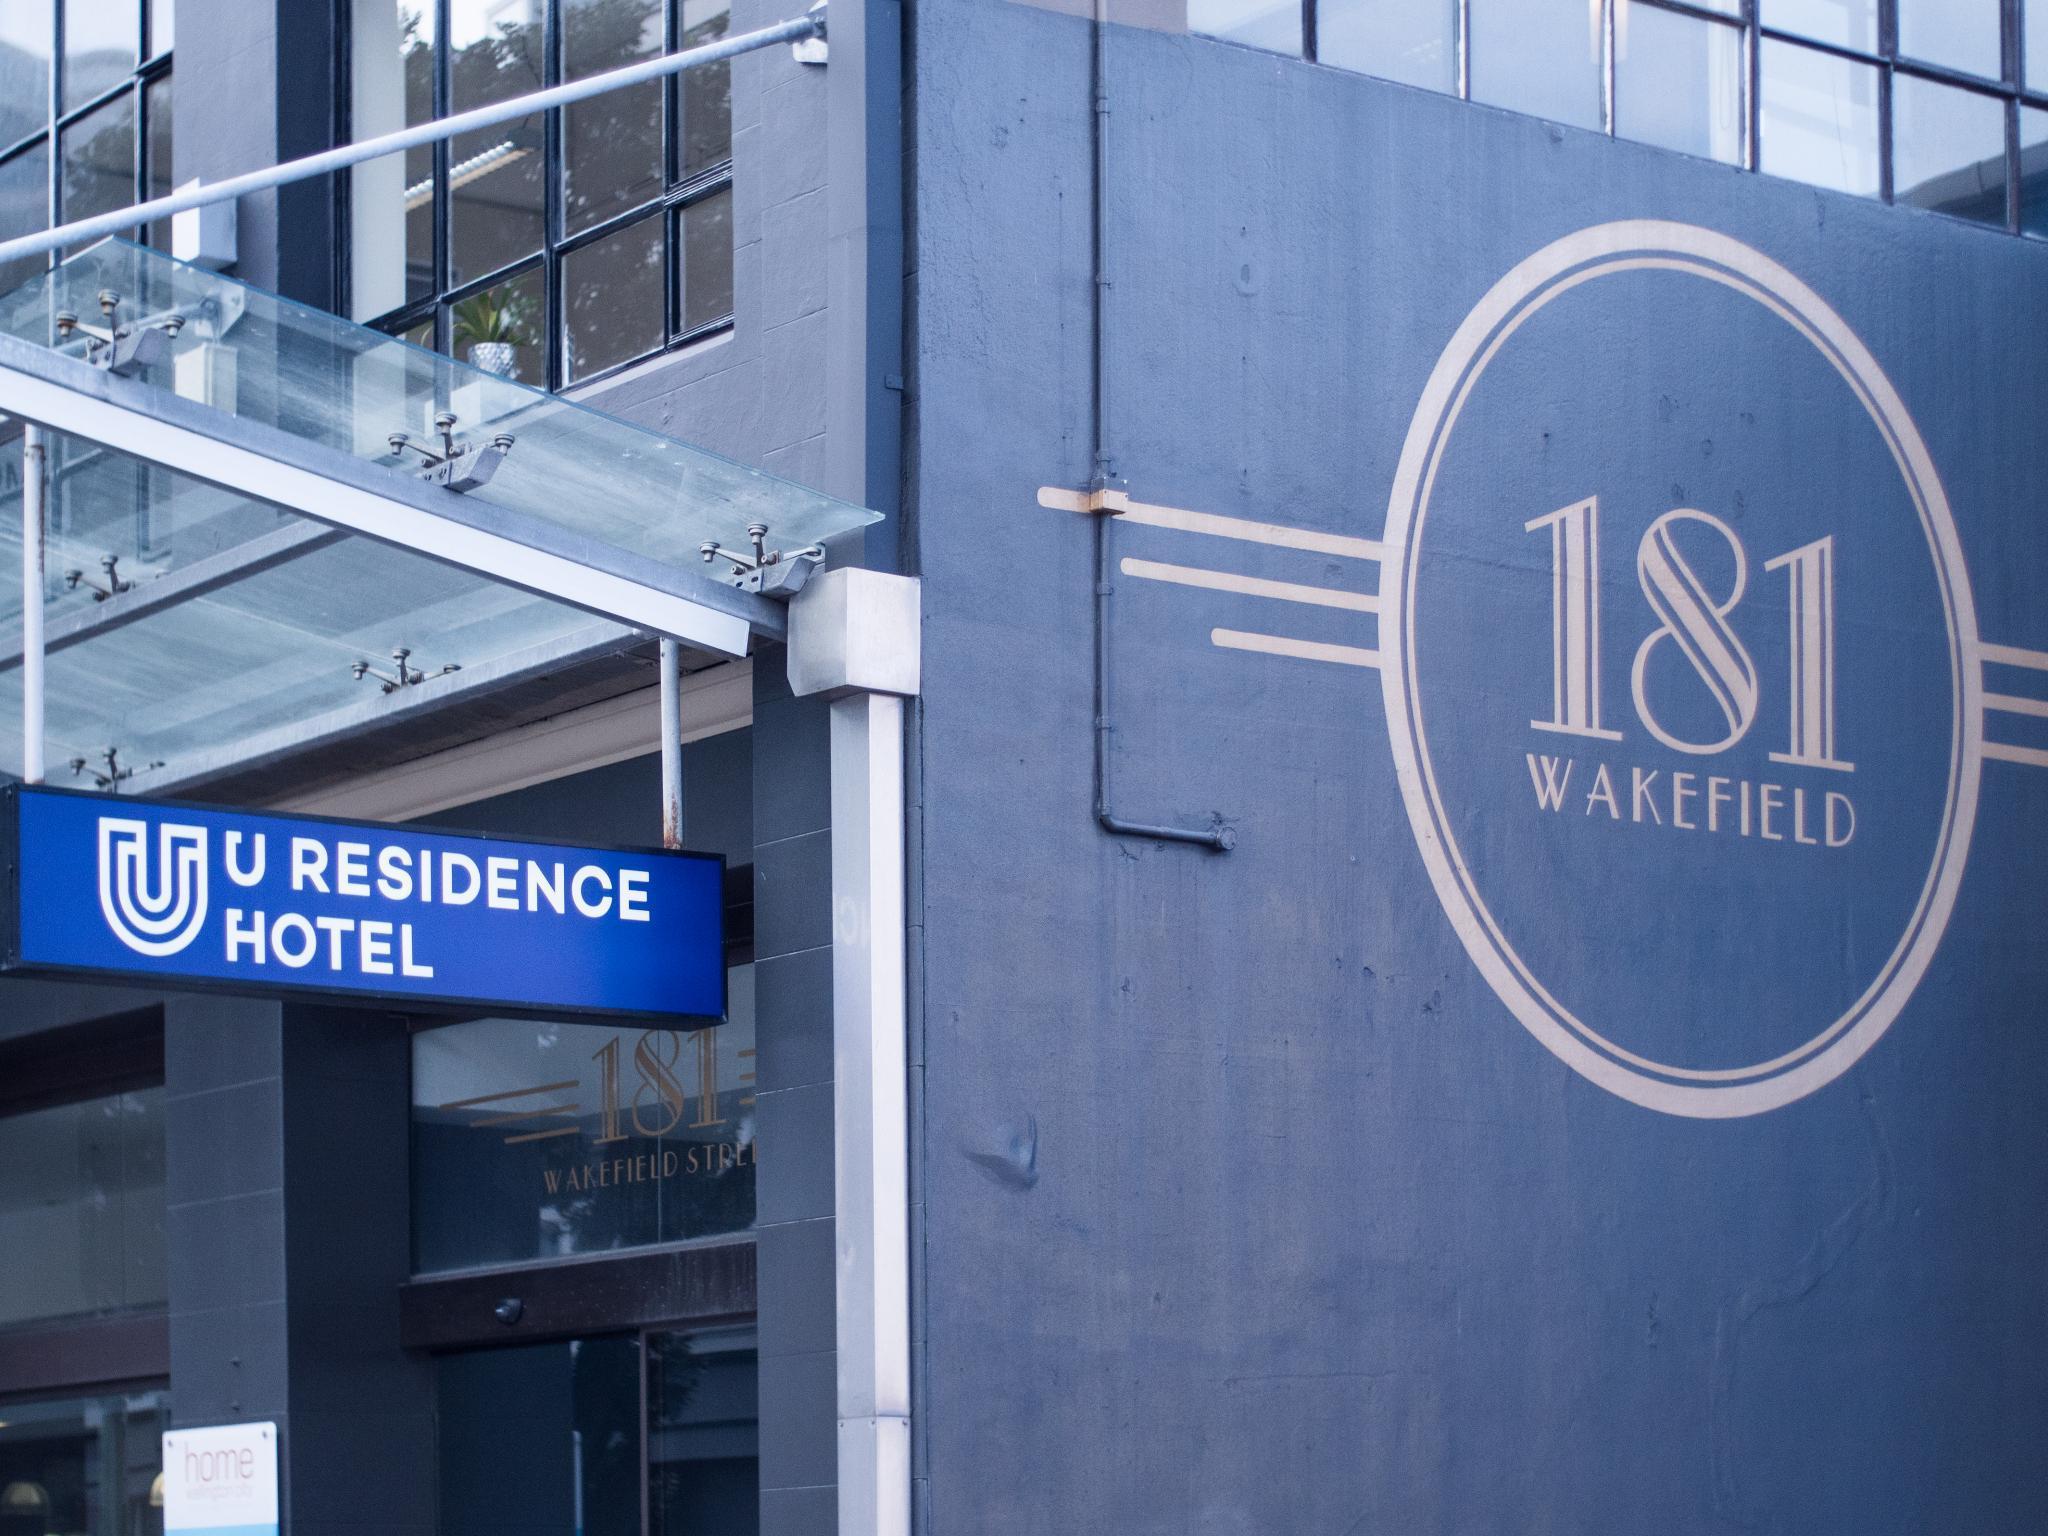 U Residence Hotel